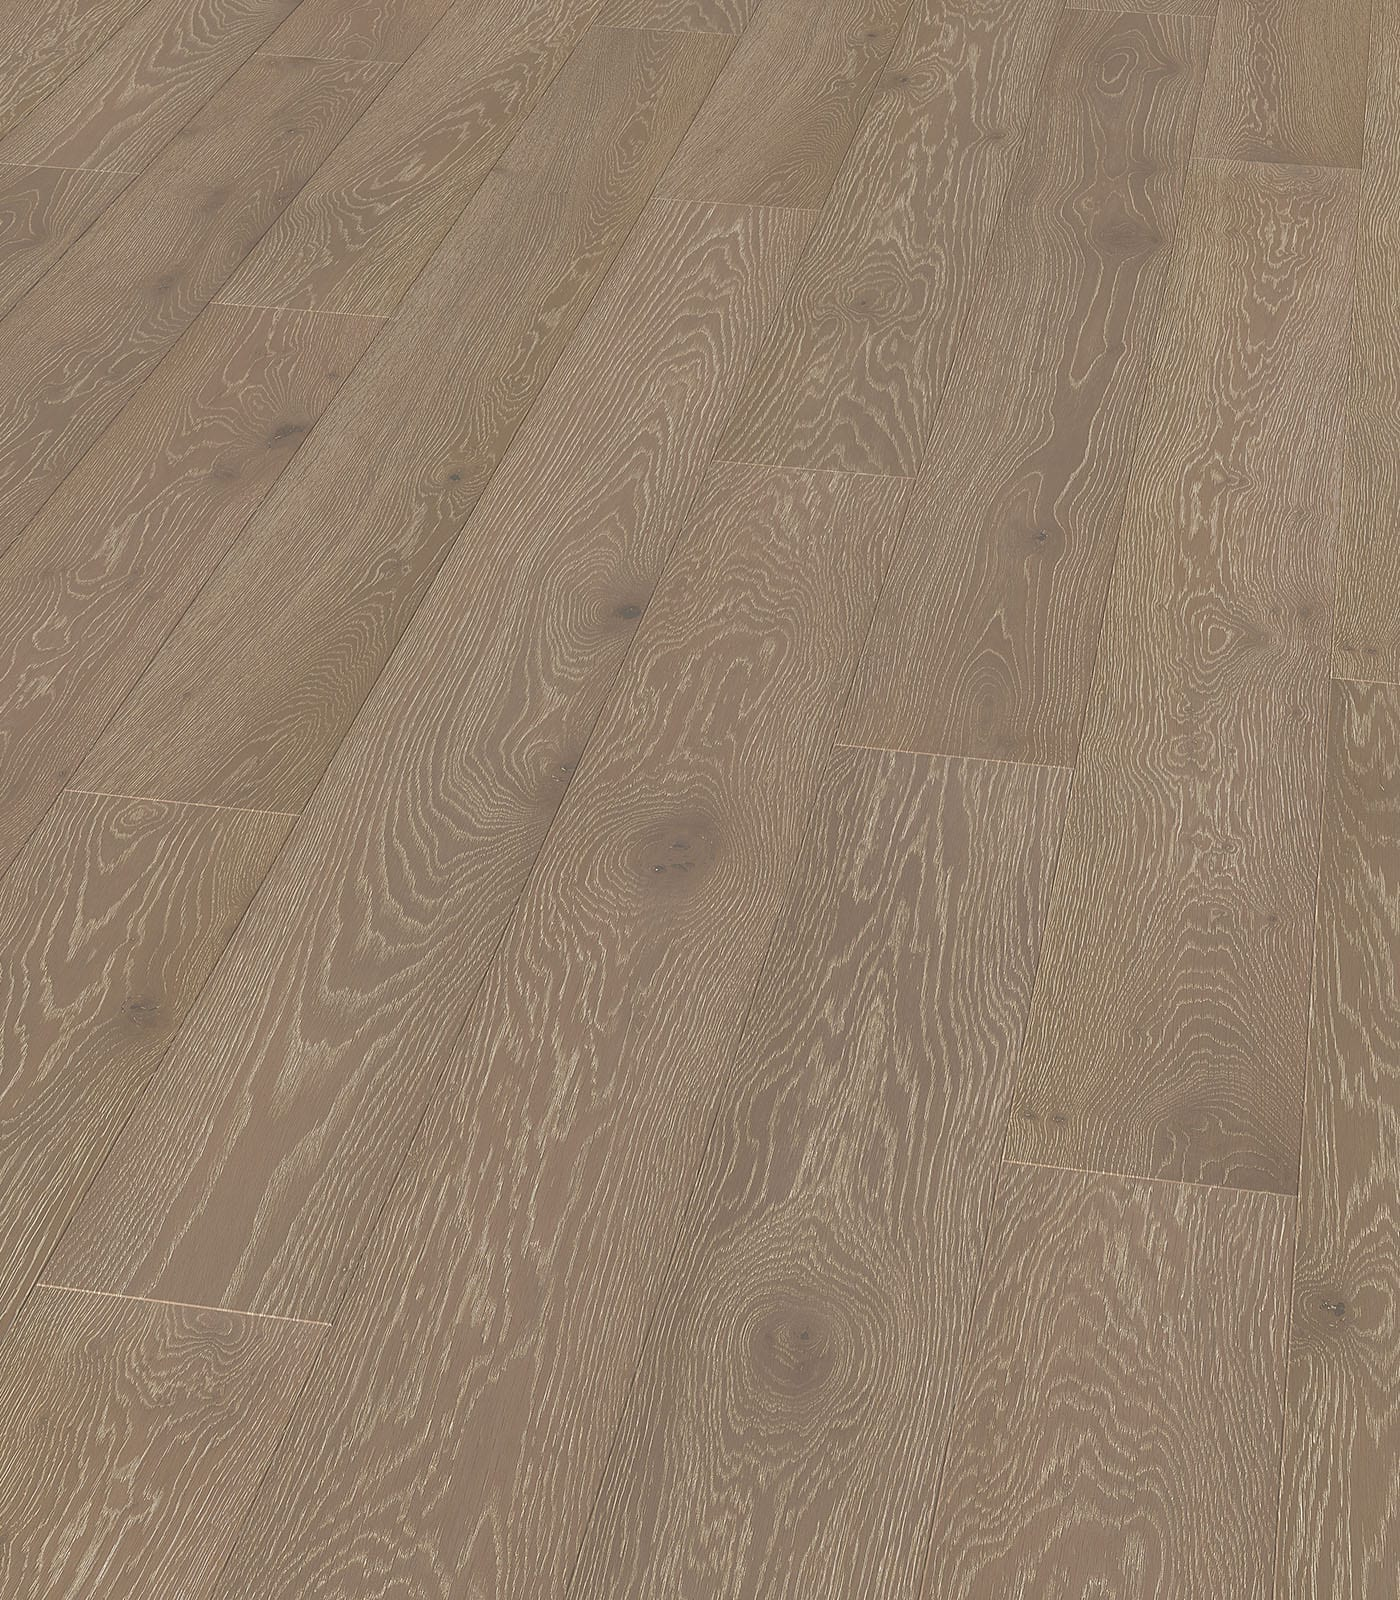 Tenne-Colors Collection-European Oak Floors-angle